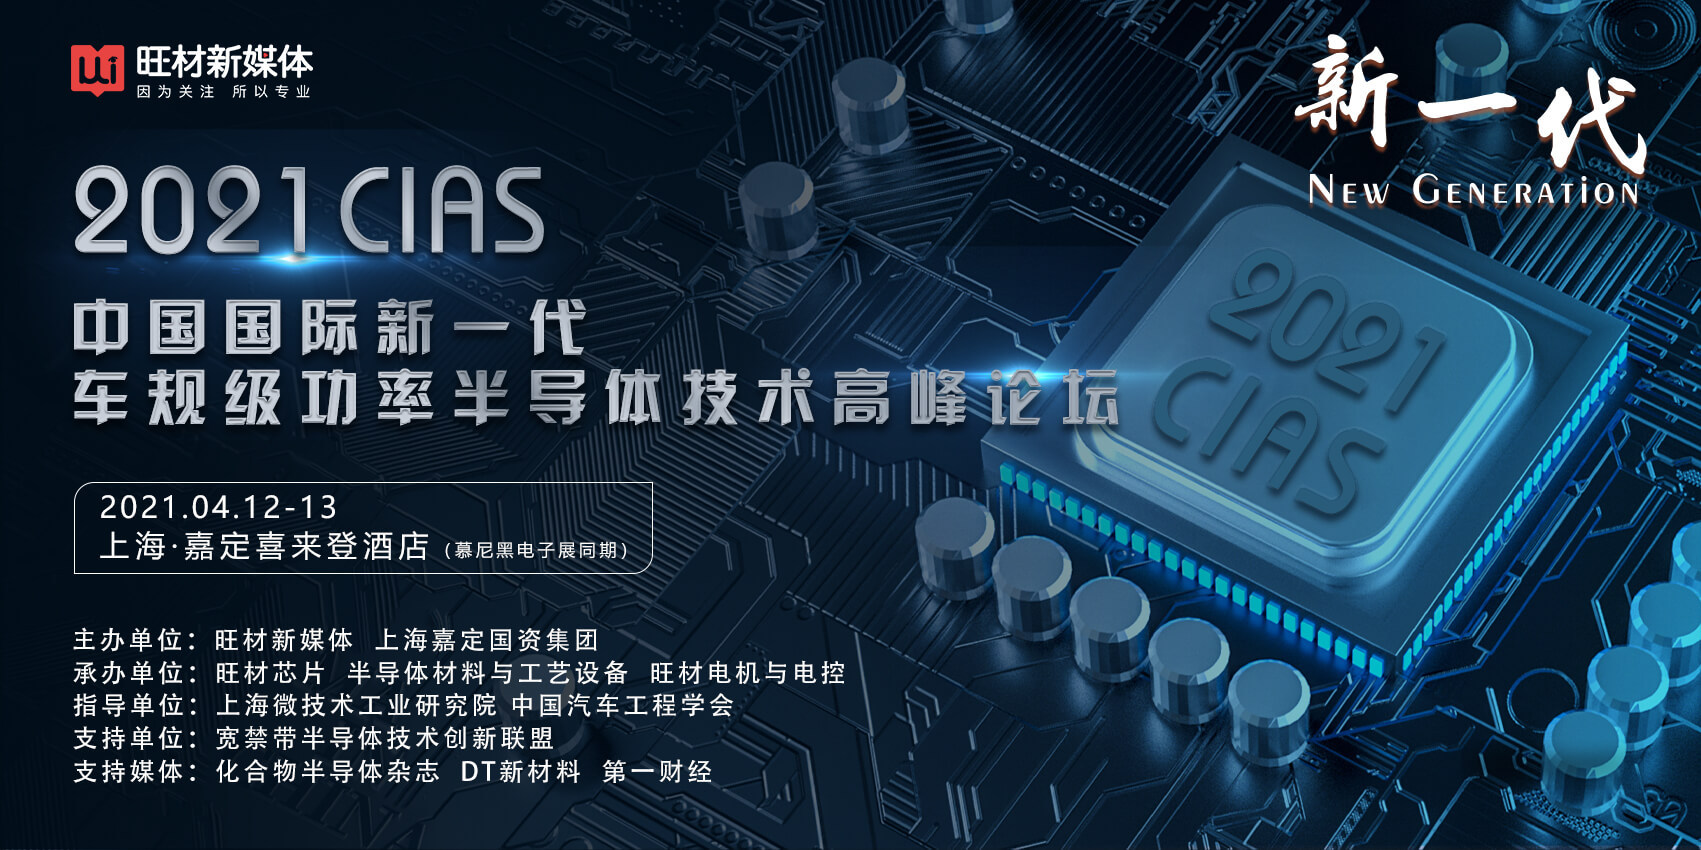 2021 CIAS中国国际新一代车规级功率半导体技术高峰论坛